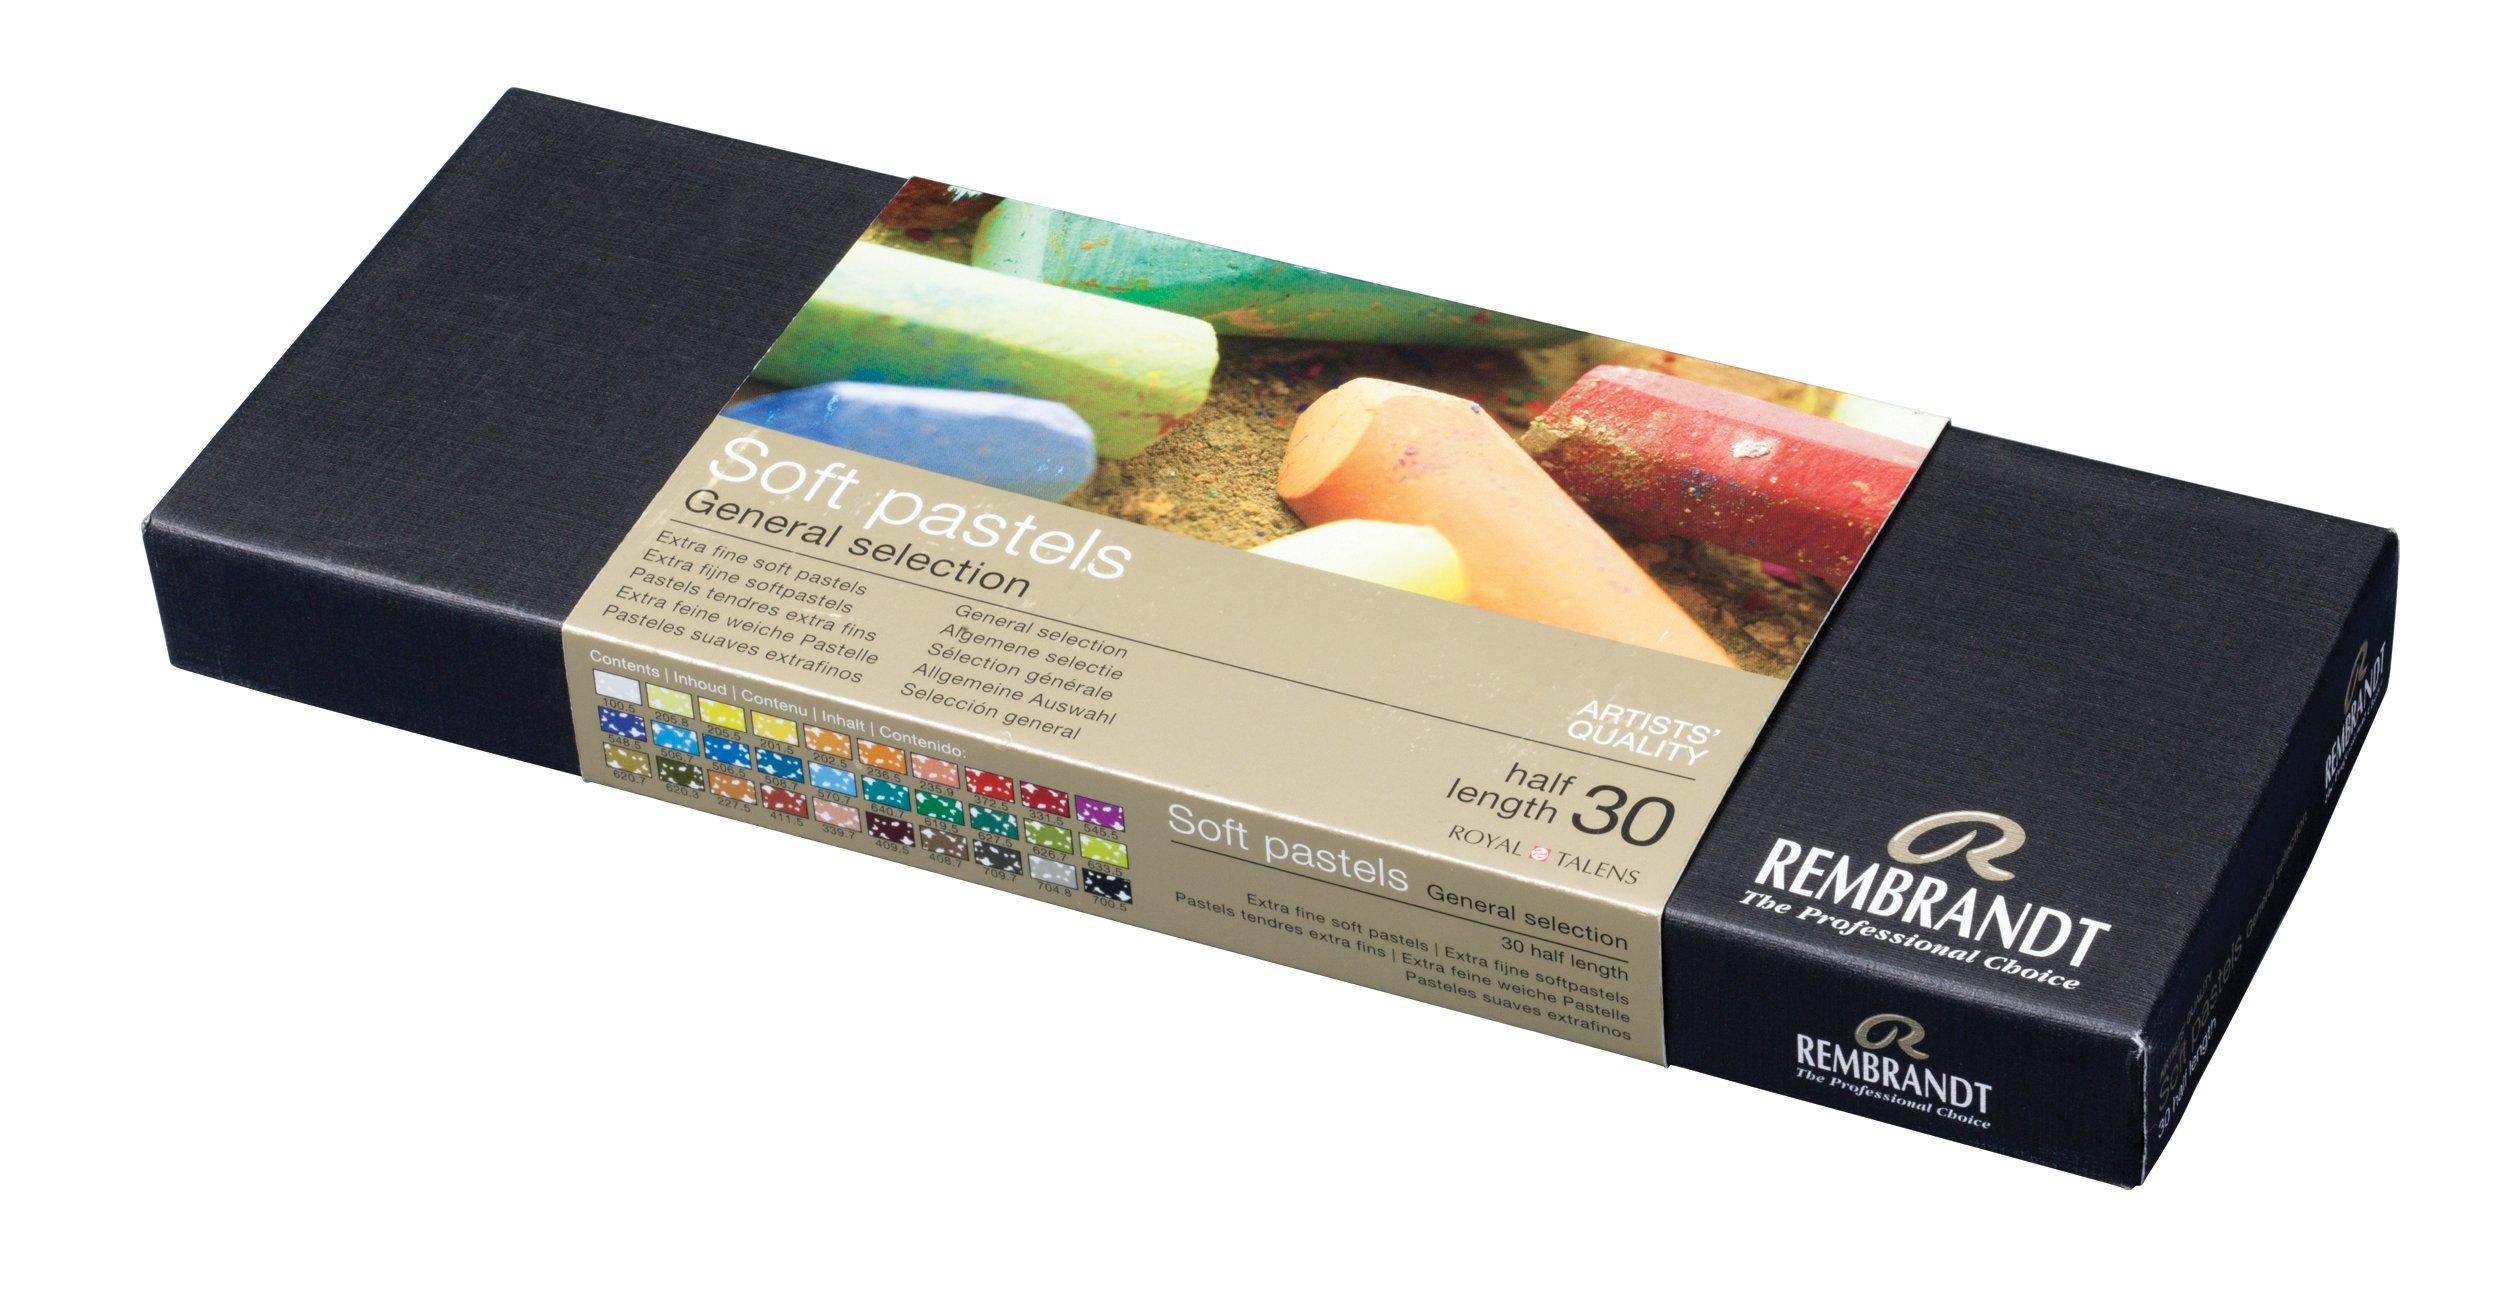 Rembrandt Soft Pastels Basic 30 Half Stick Set 300C30.5 by Talens